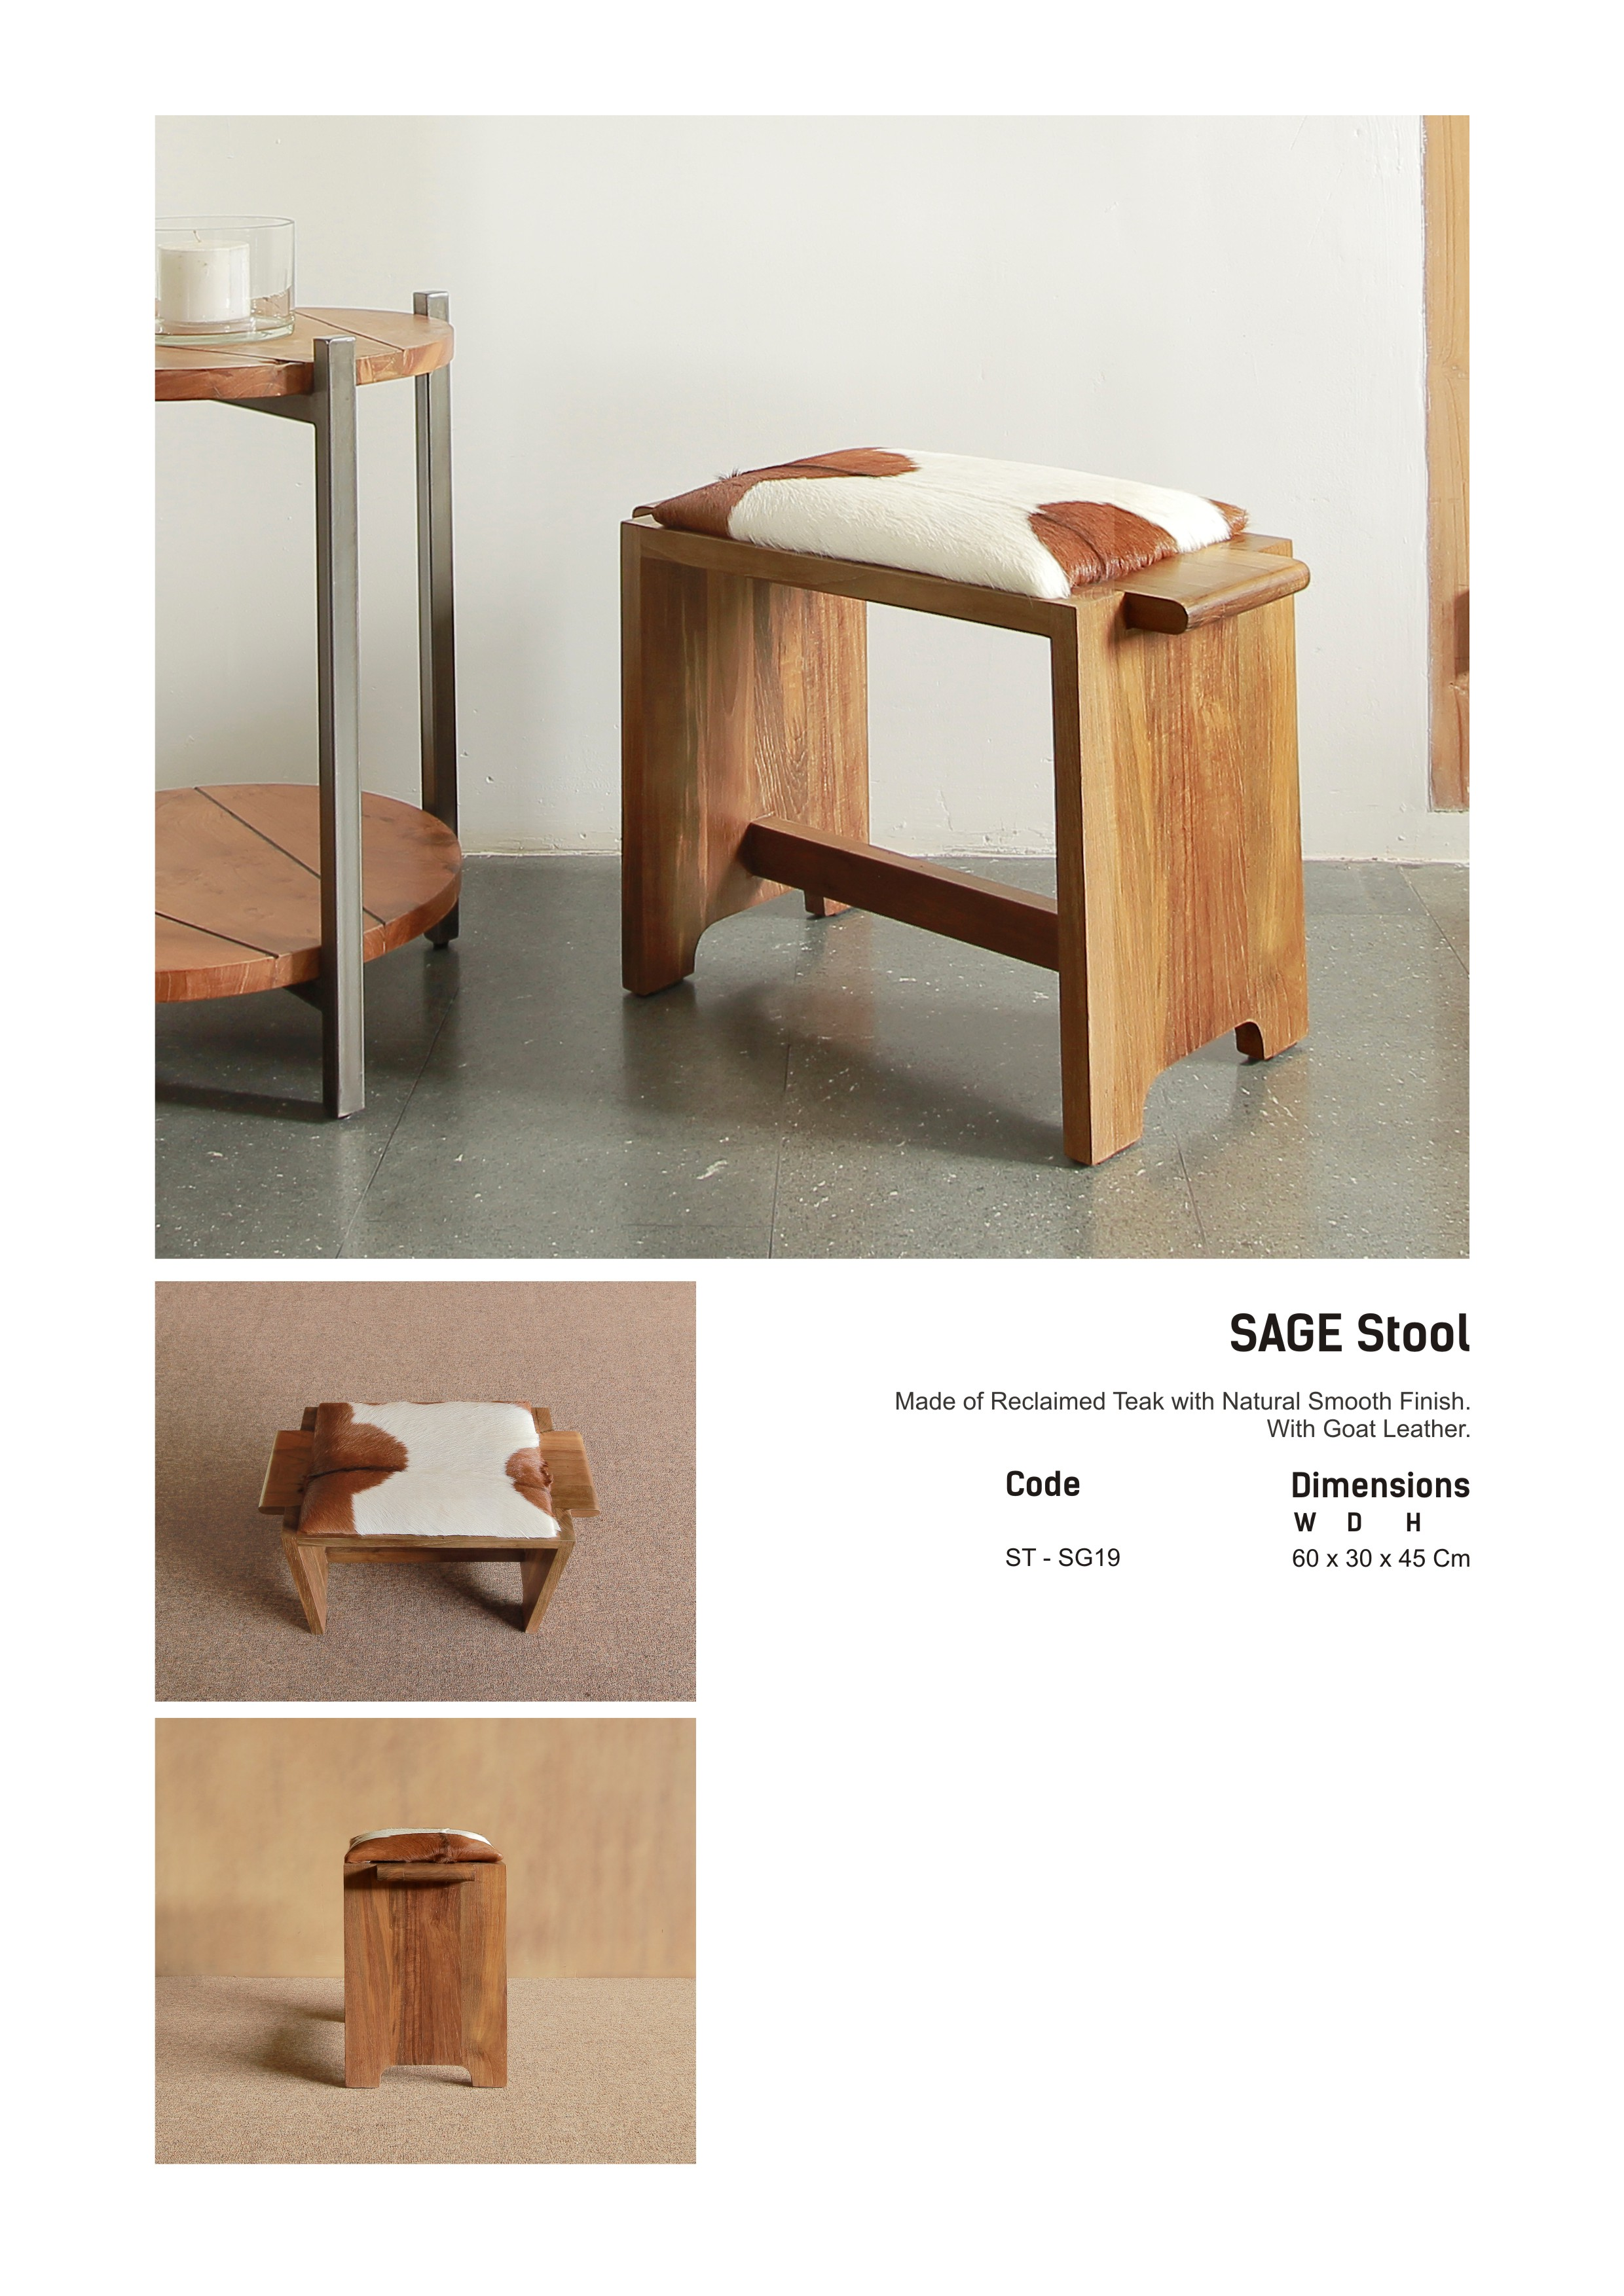 19. SAGE Stool